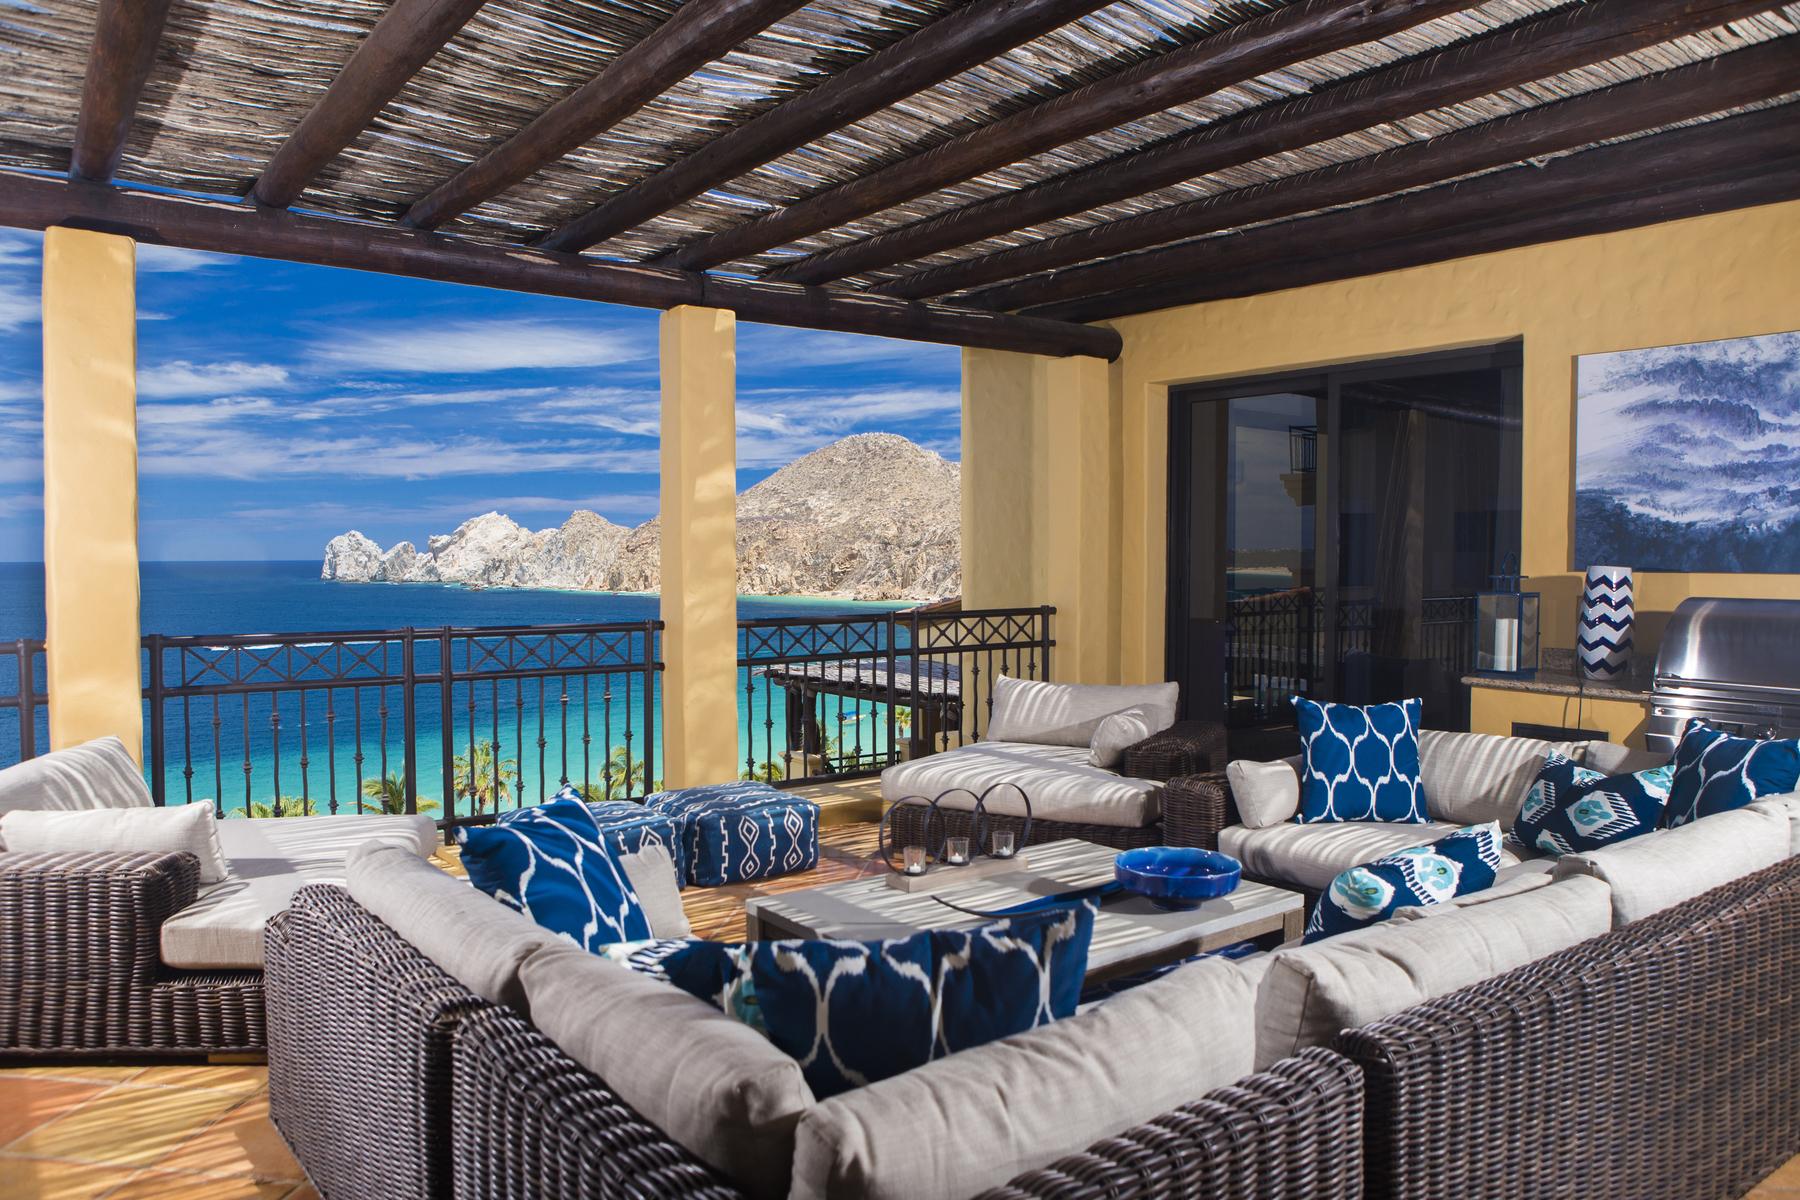 Condominiums för Hyra vid Penthouse 2-501 Penthouse 2501 Valentin Gomez Farias S/N Cabo San Lucas, Baja California Sur 23543 Mexiko